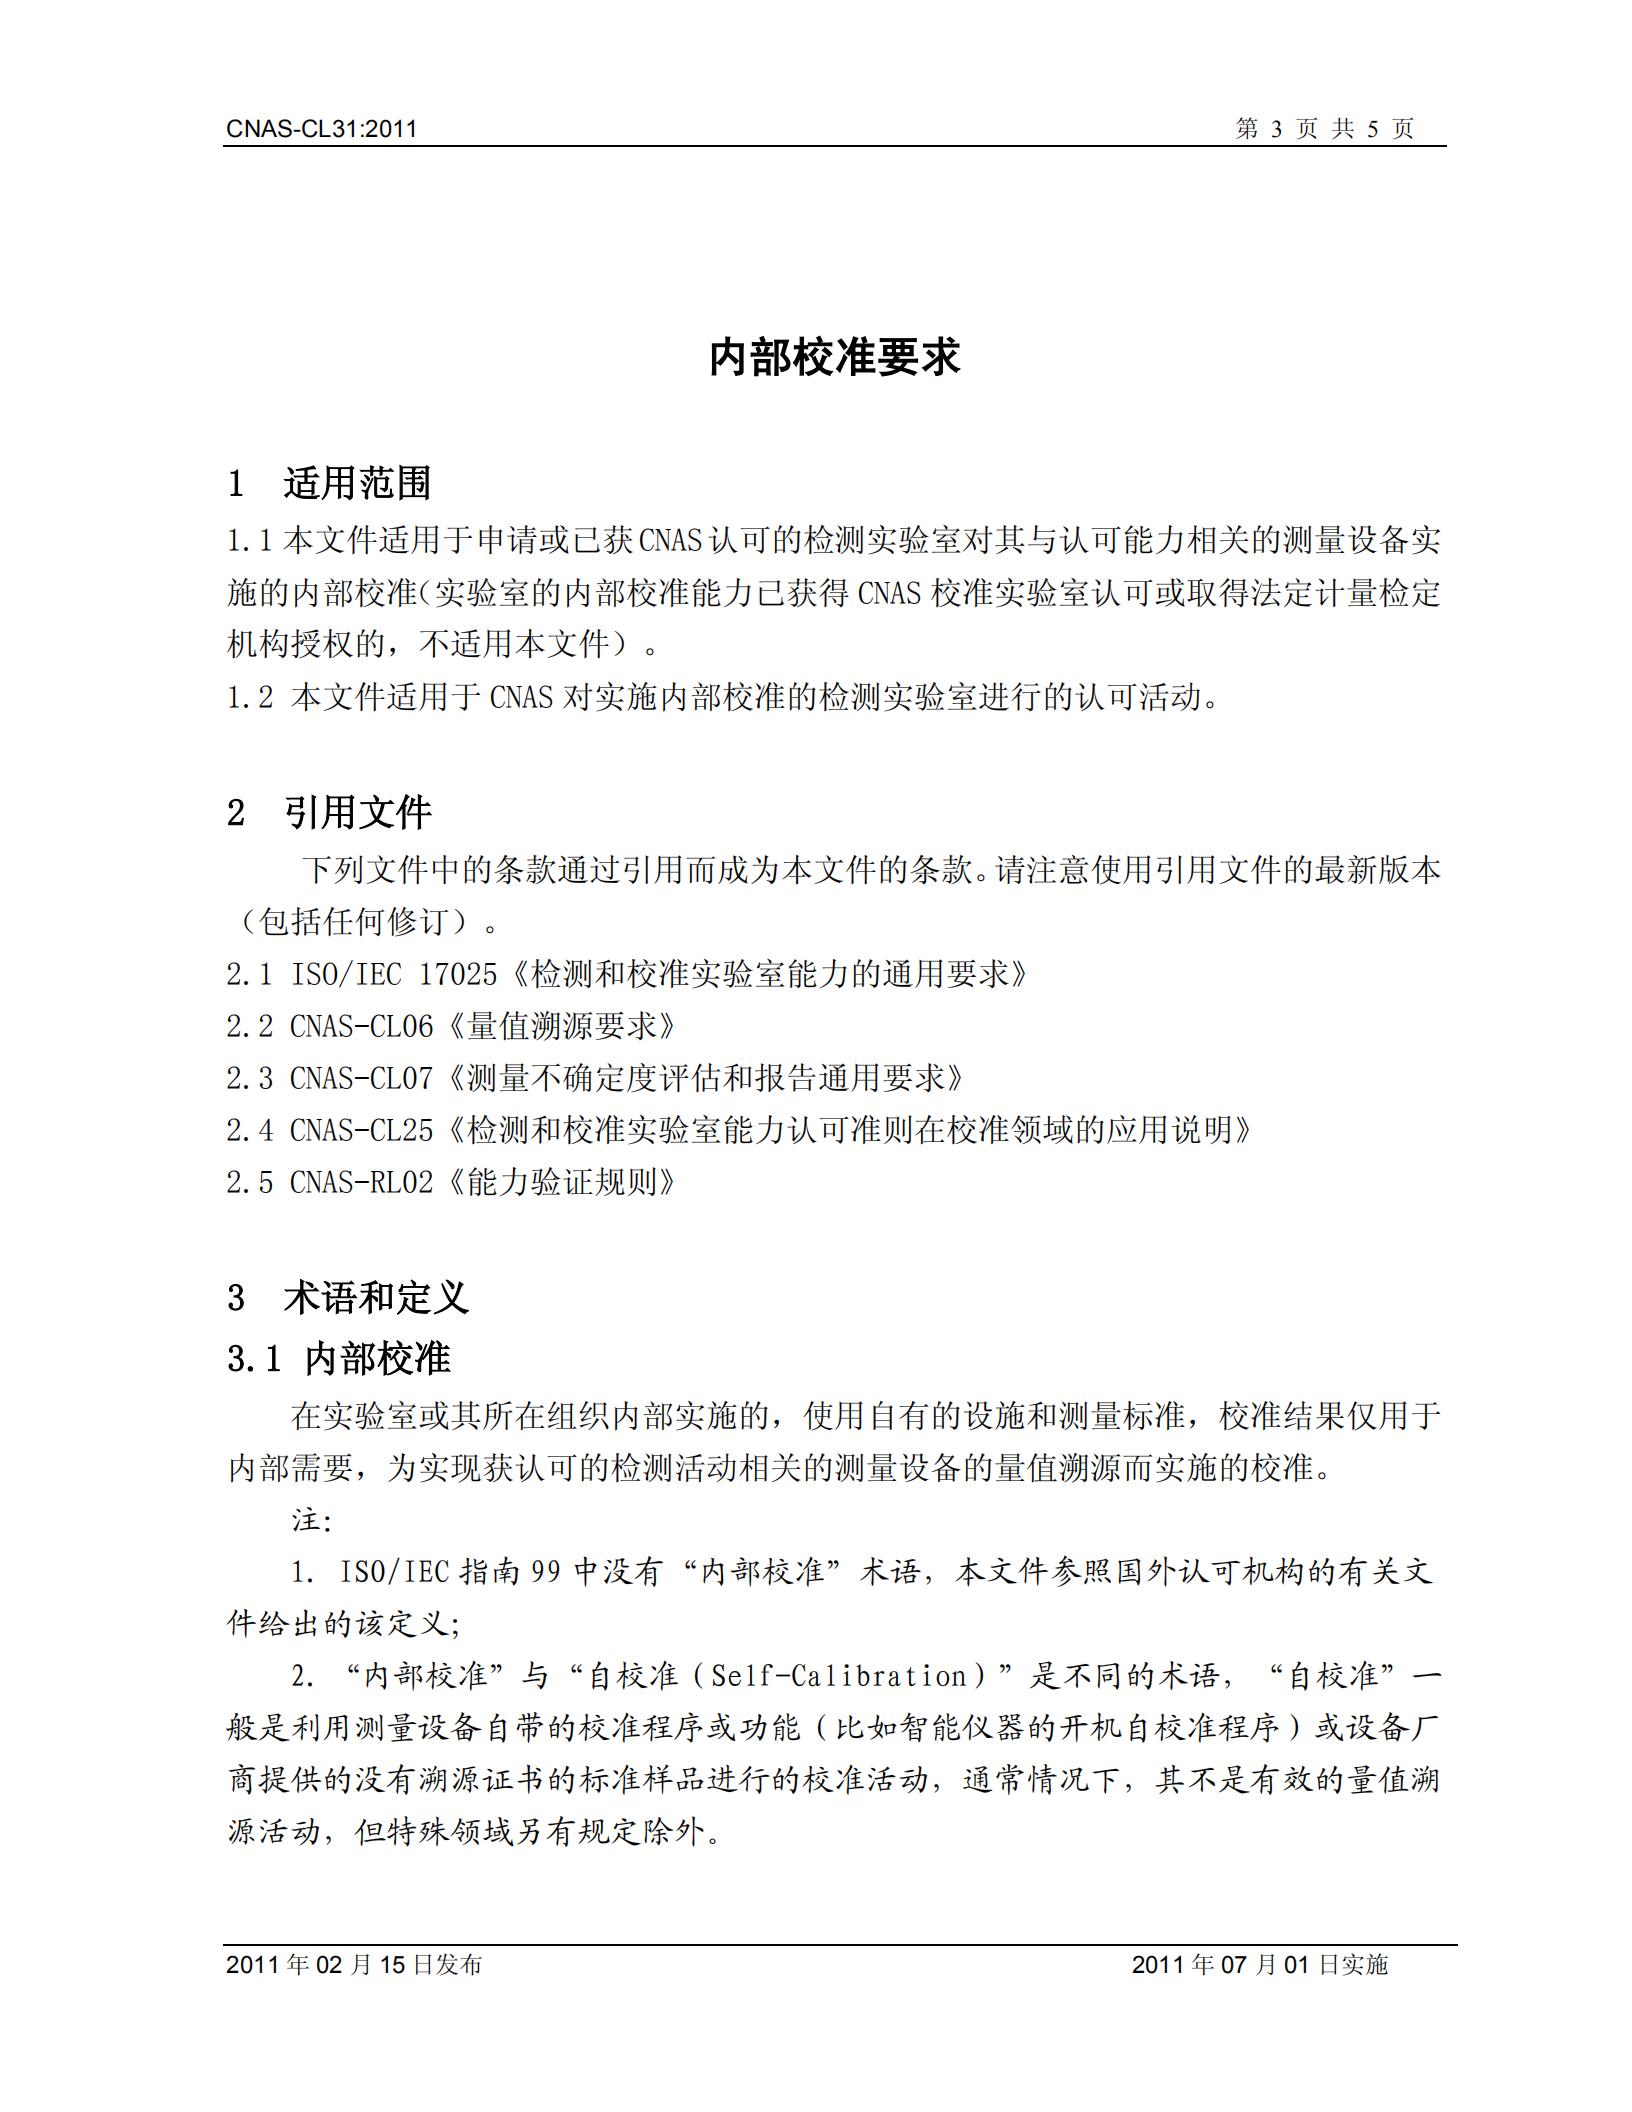 CNAS-CL31内部校准要求_02.png